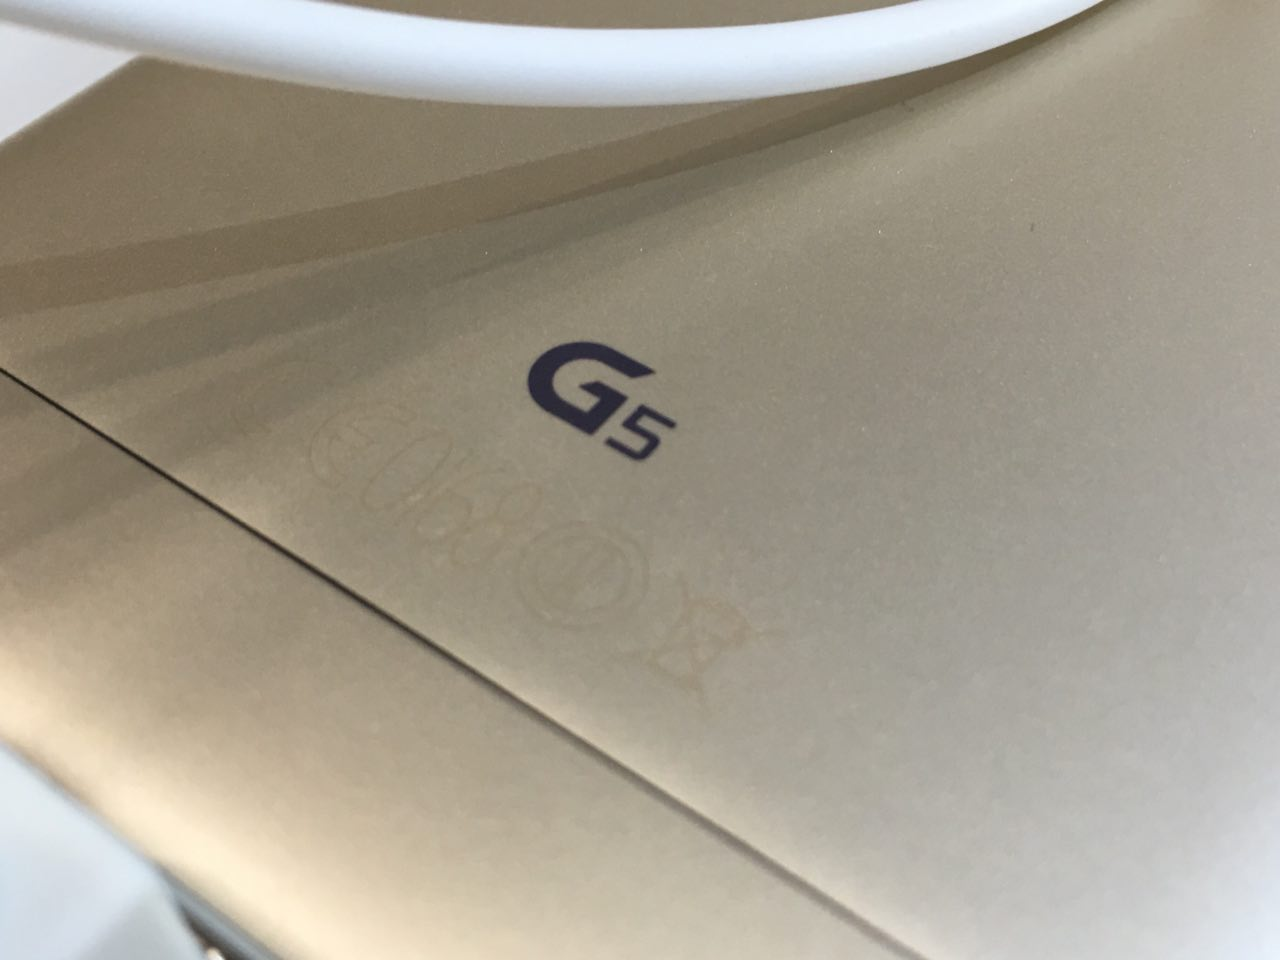 LG G5 MWC16